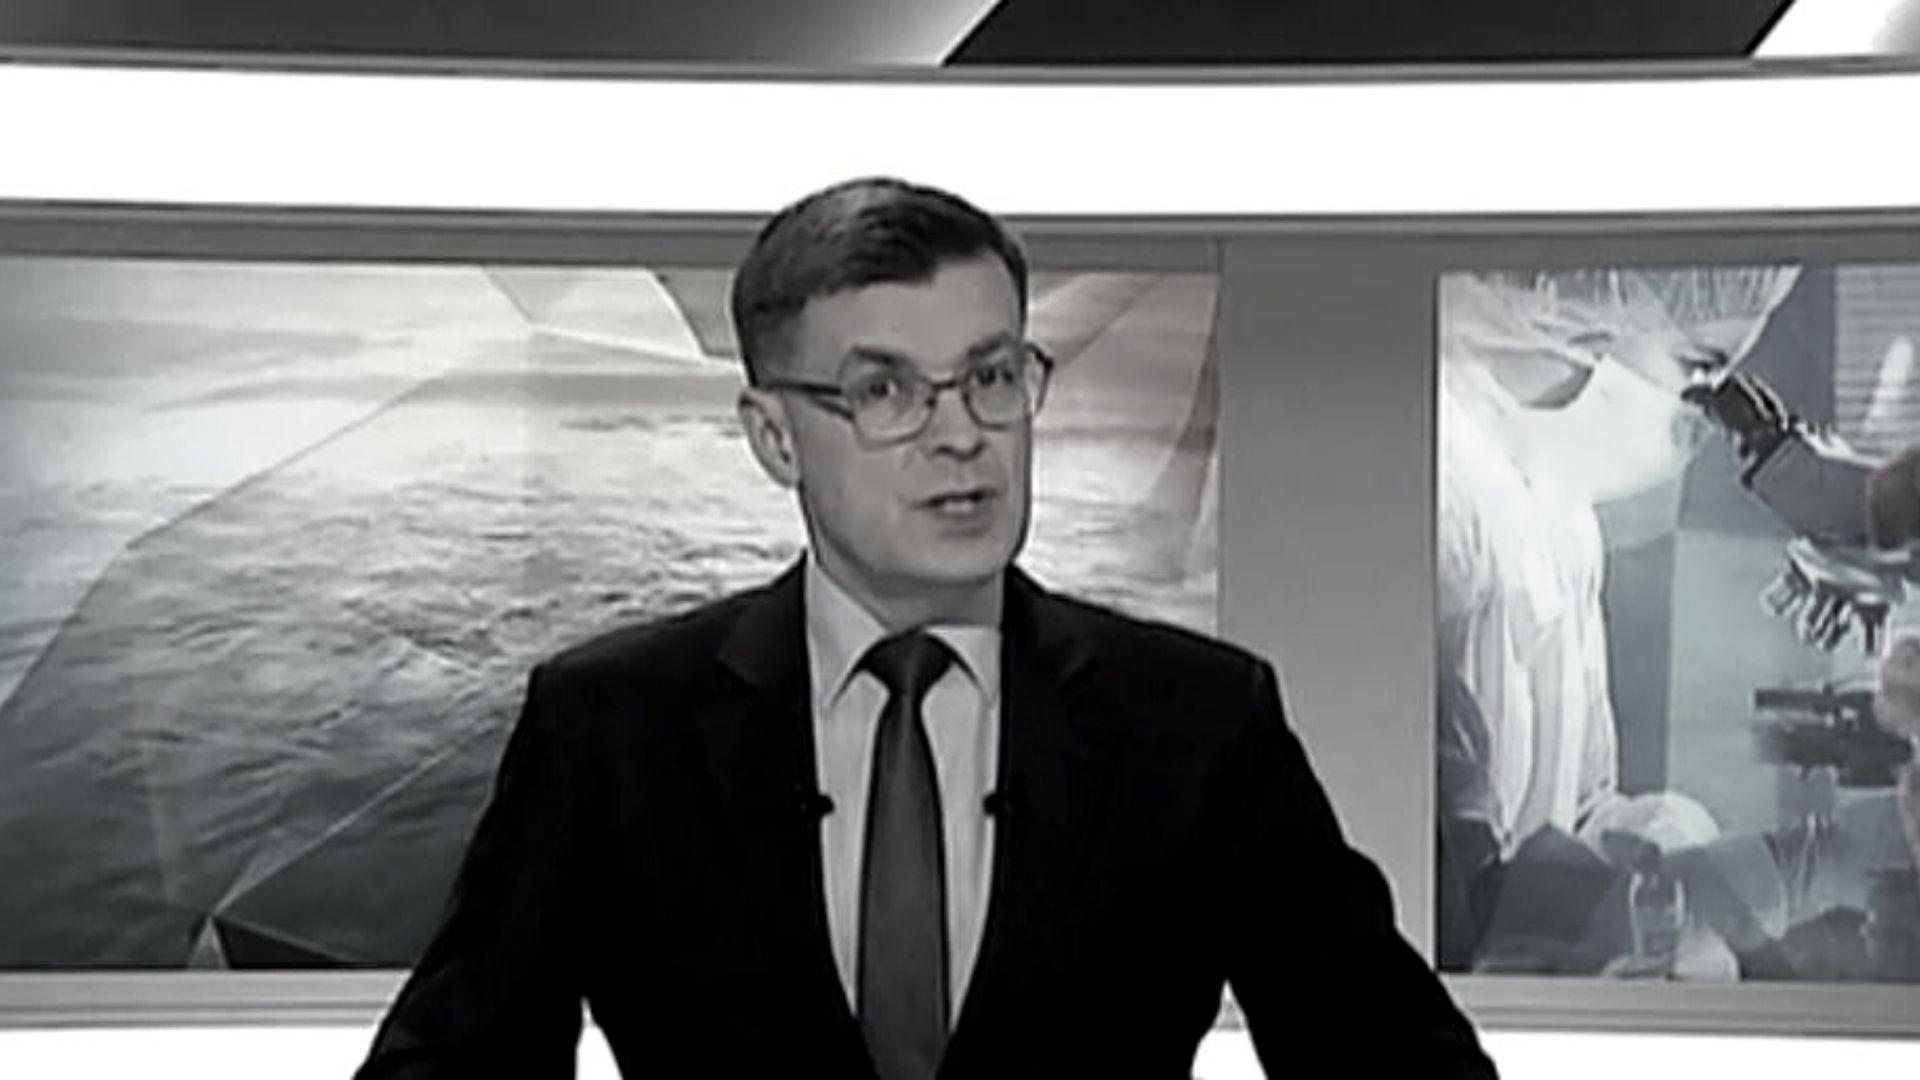 Piotr Świąc